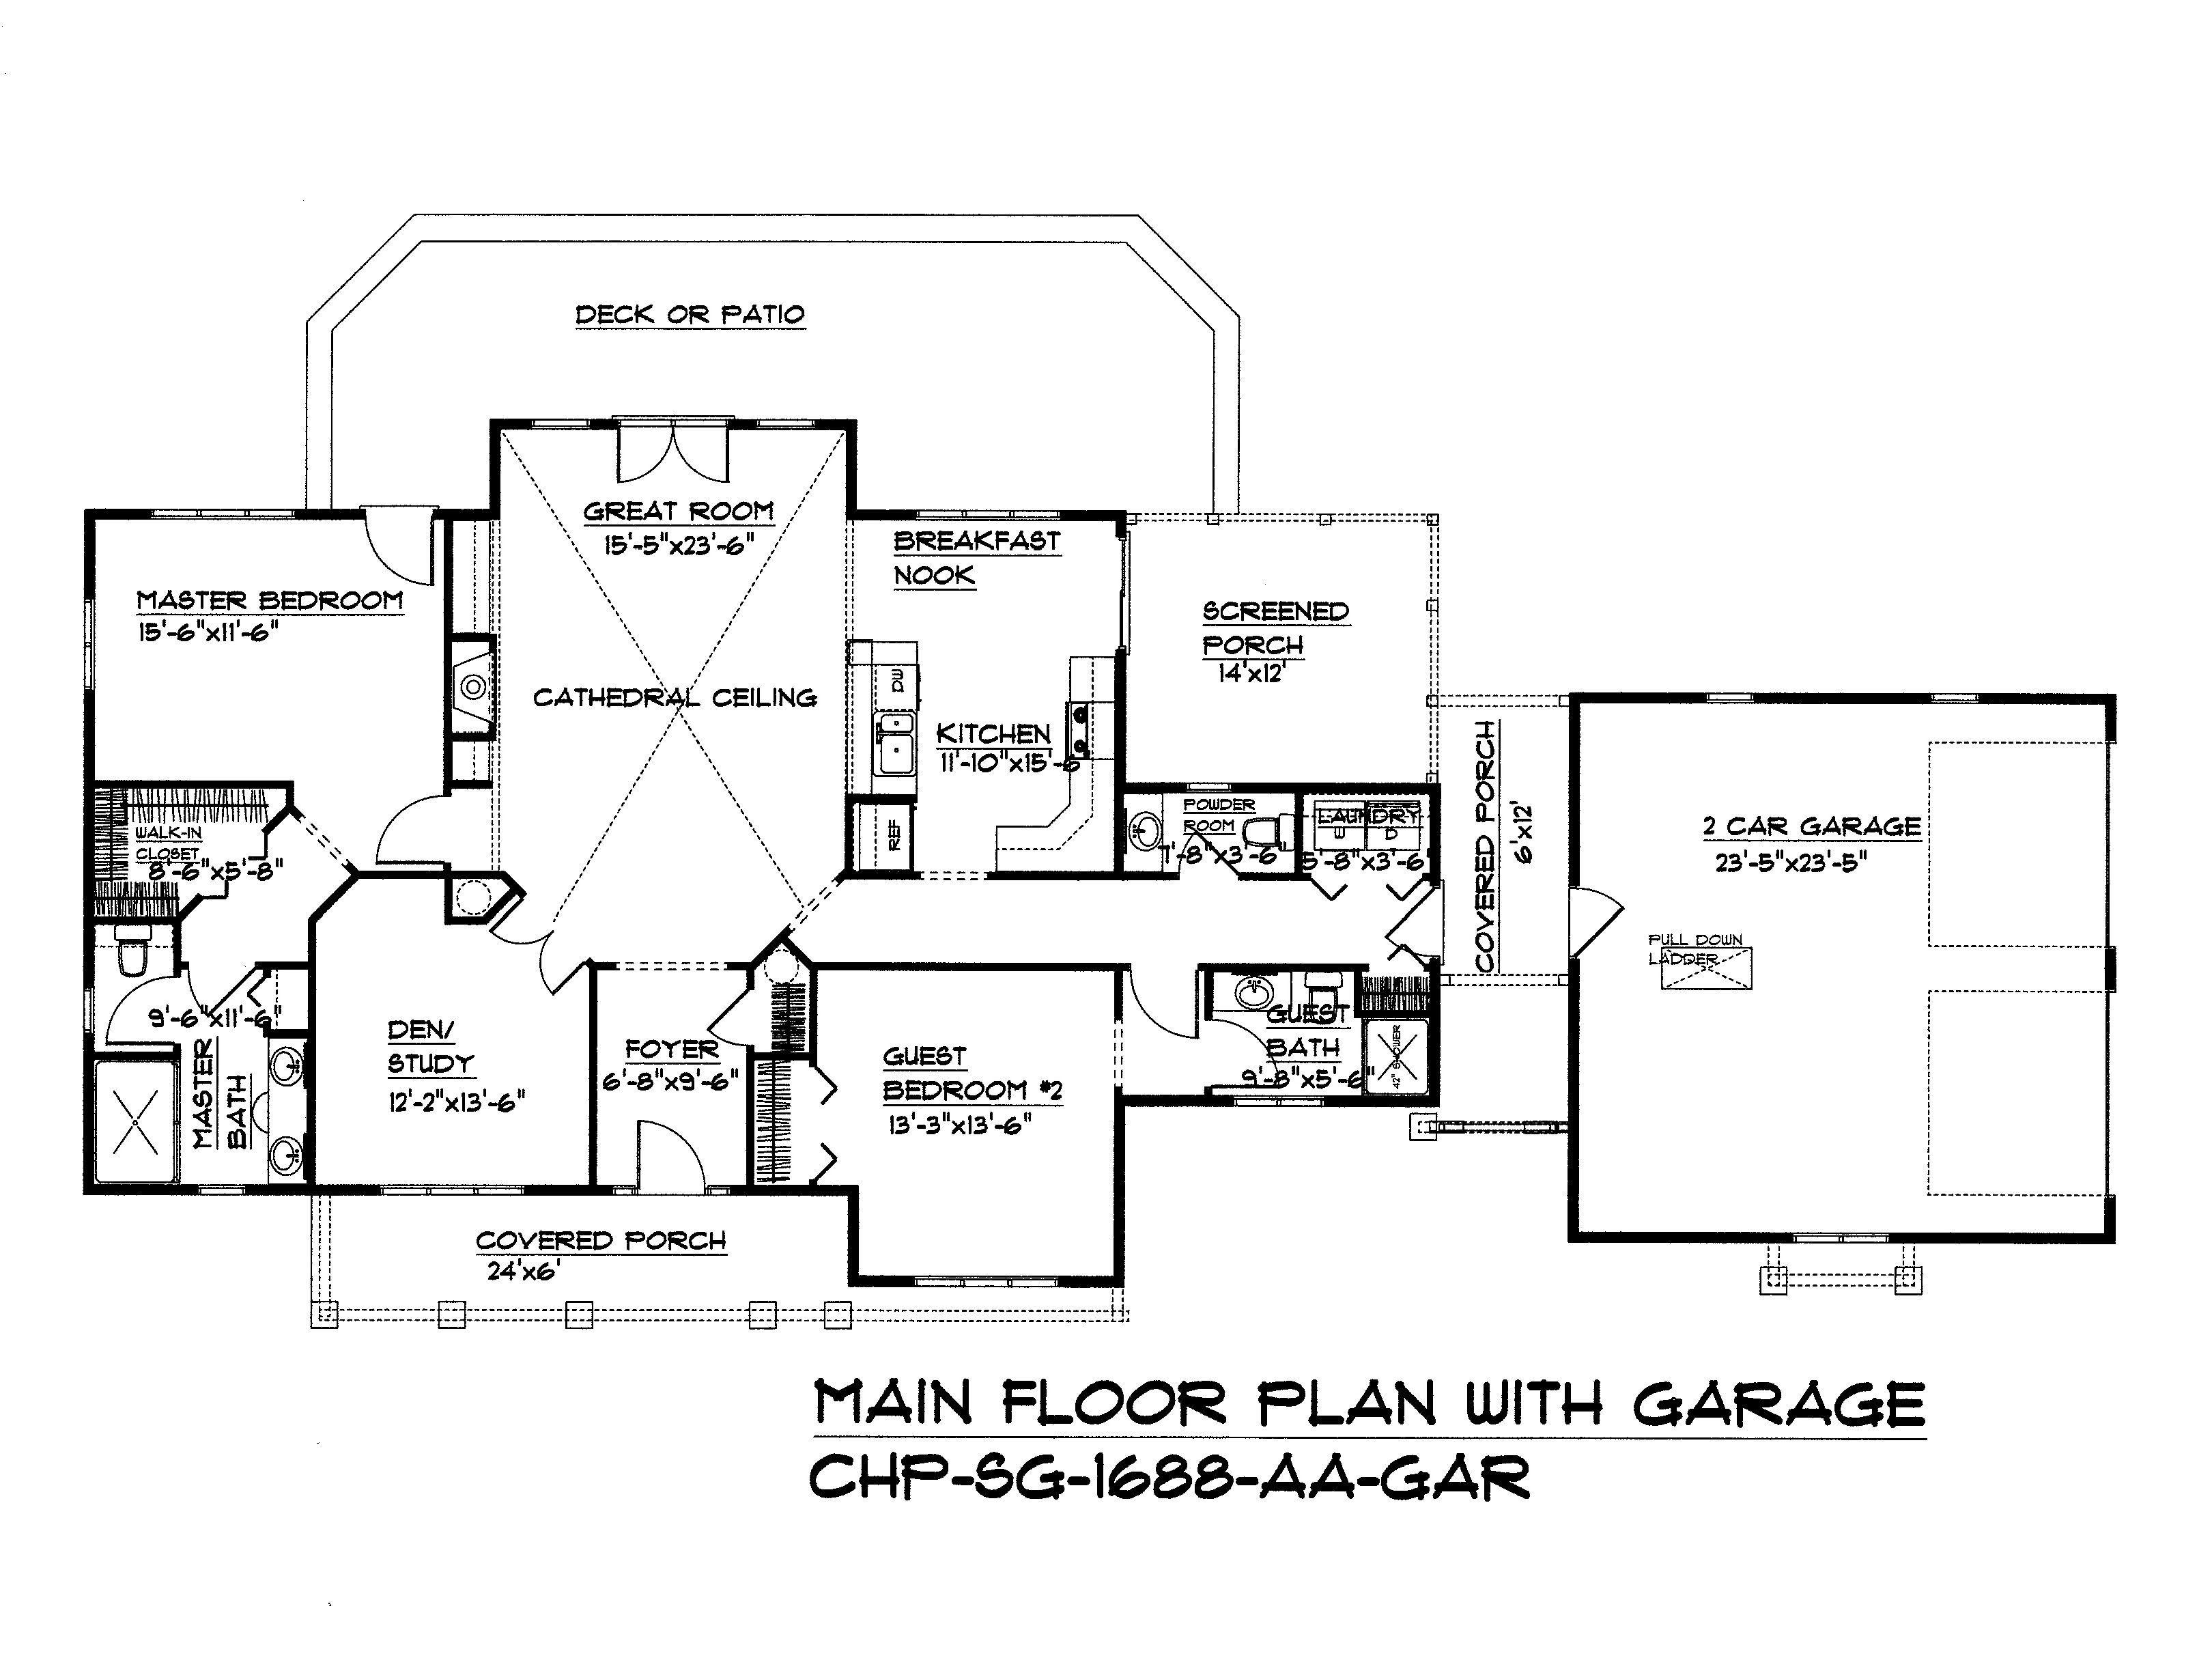 Split Bedroom, Dual Master Suite Floor Plan SG-1688-AA By